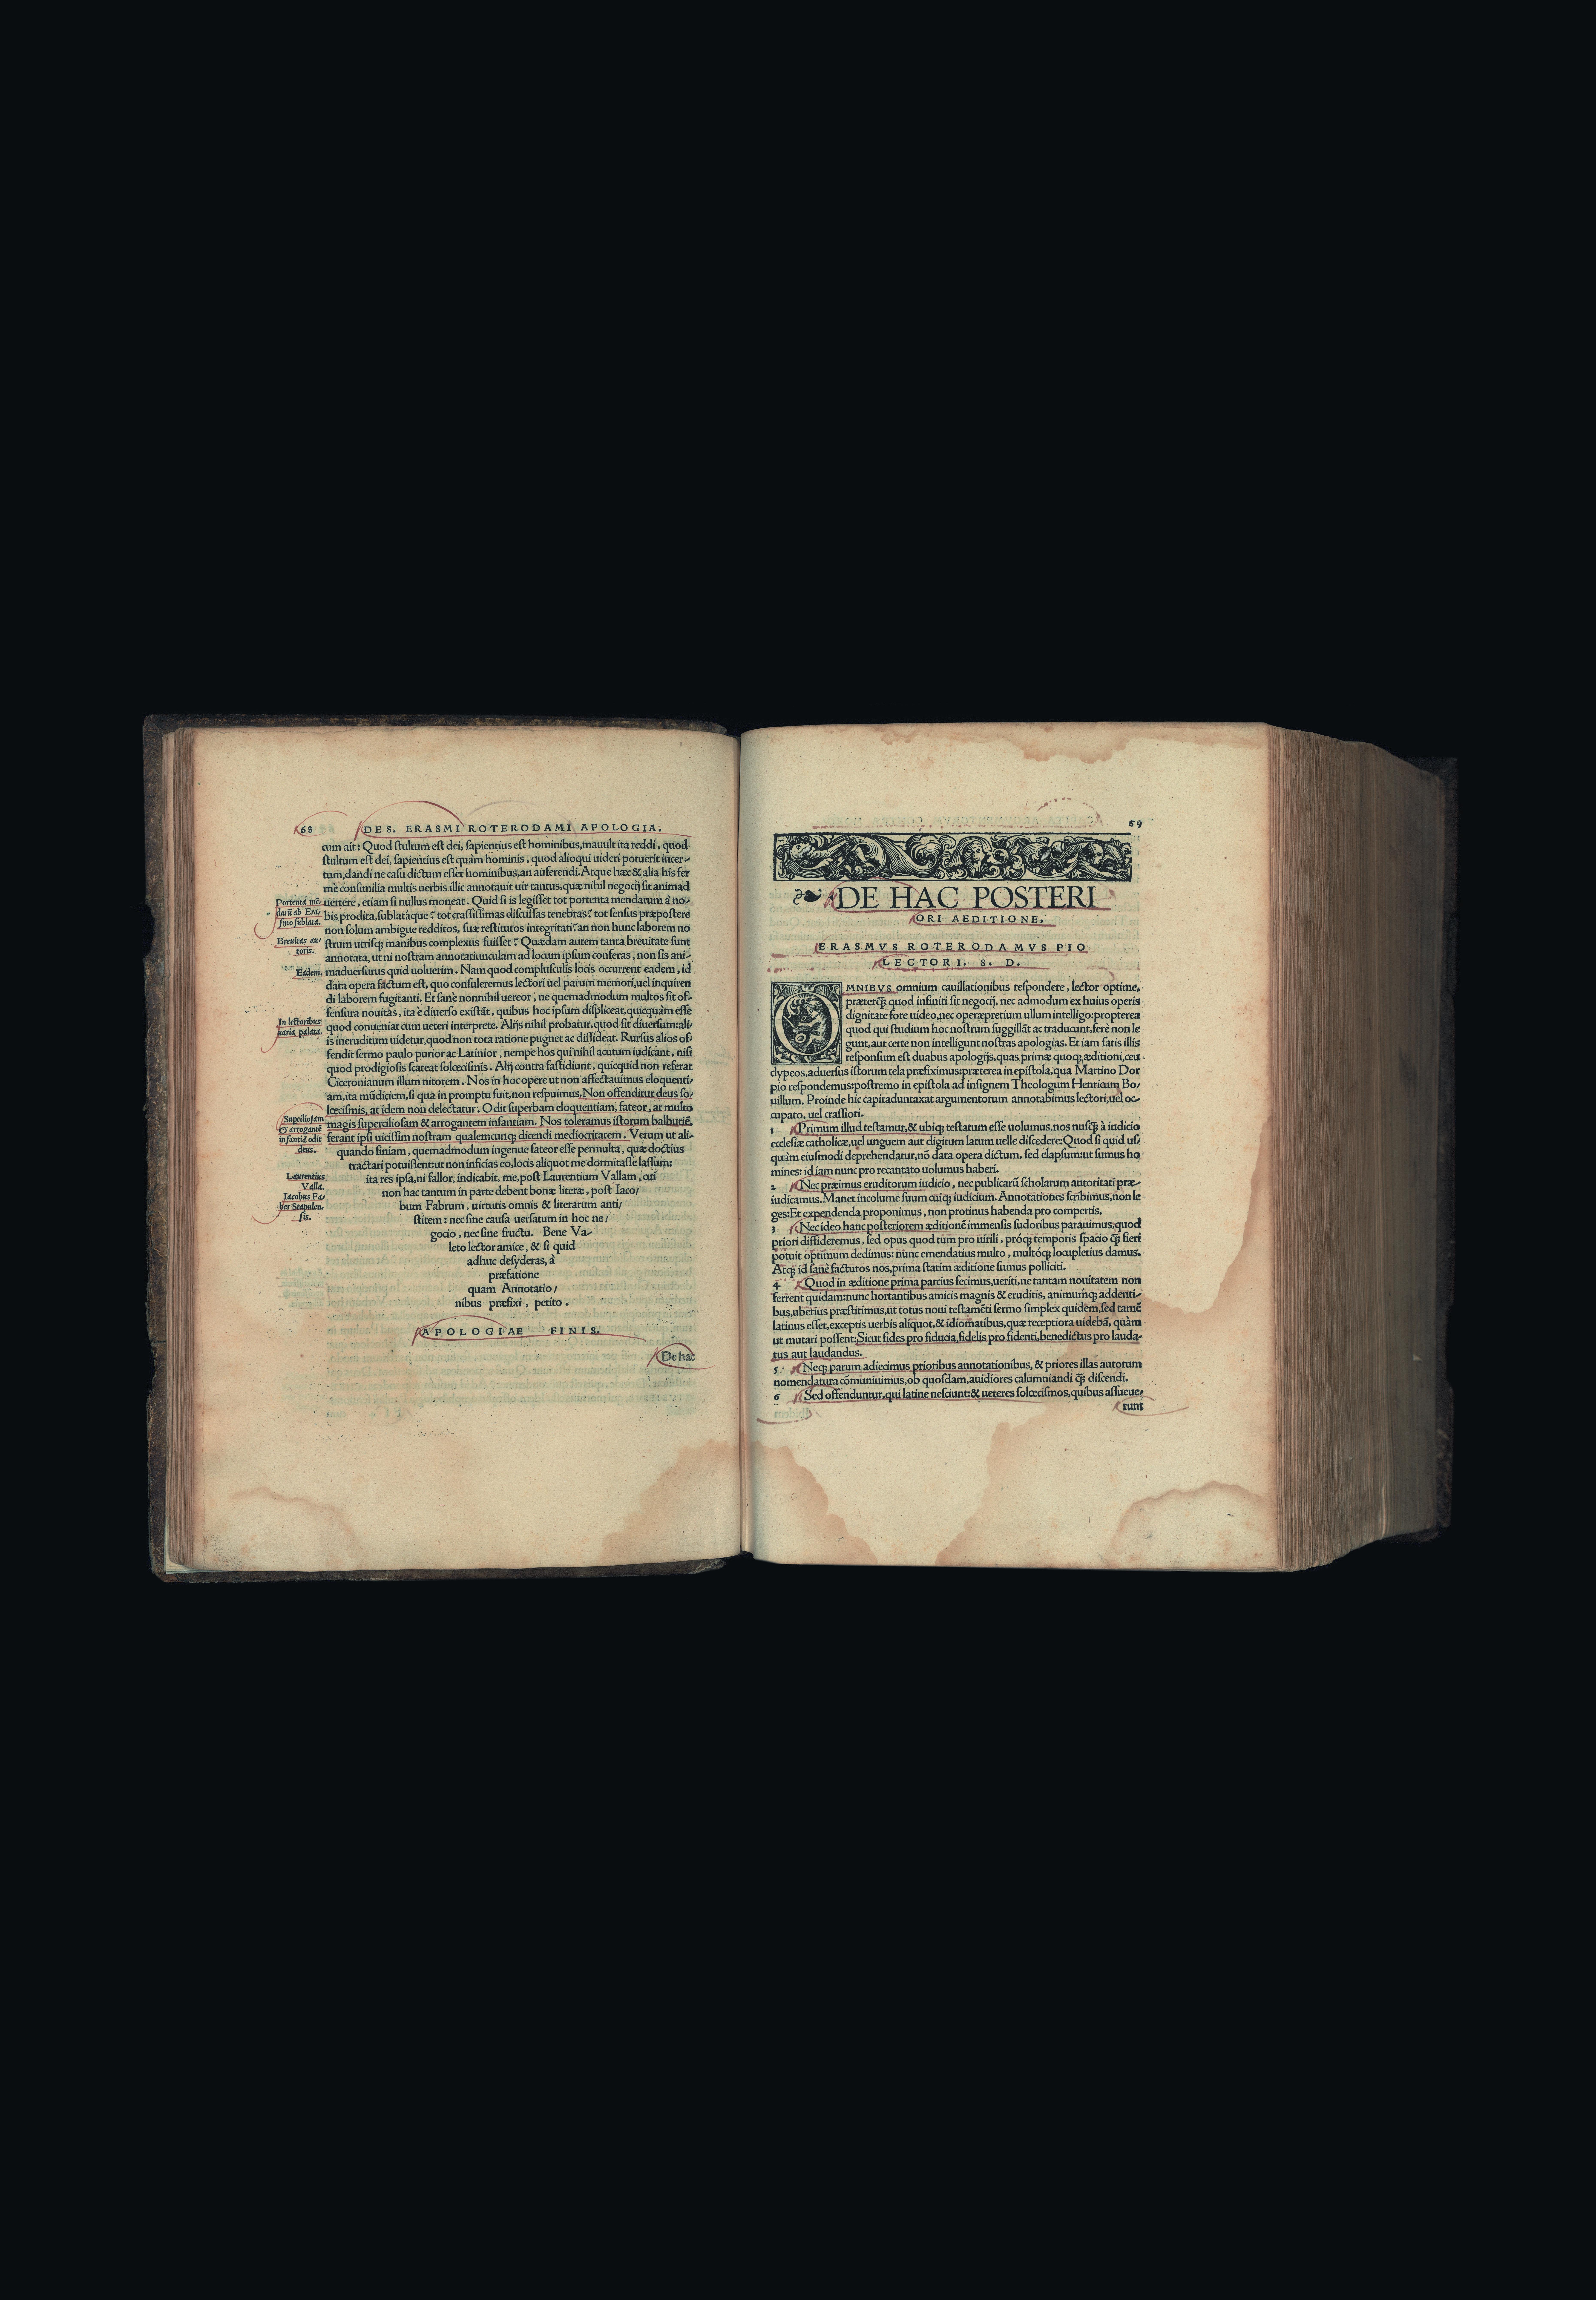 Figure 5 - Un exemple de livre « moderne » : Novum             Testamentum omne, multo quam antehac diligentius ab Erasmo             Roterodamo recognitum..., [s. l.], Froben, 1519 (coll.             Bibliothèque nationale et universitaire de Strasbourg)